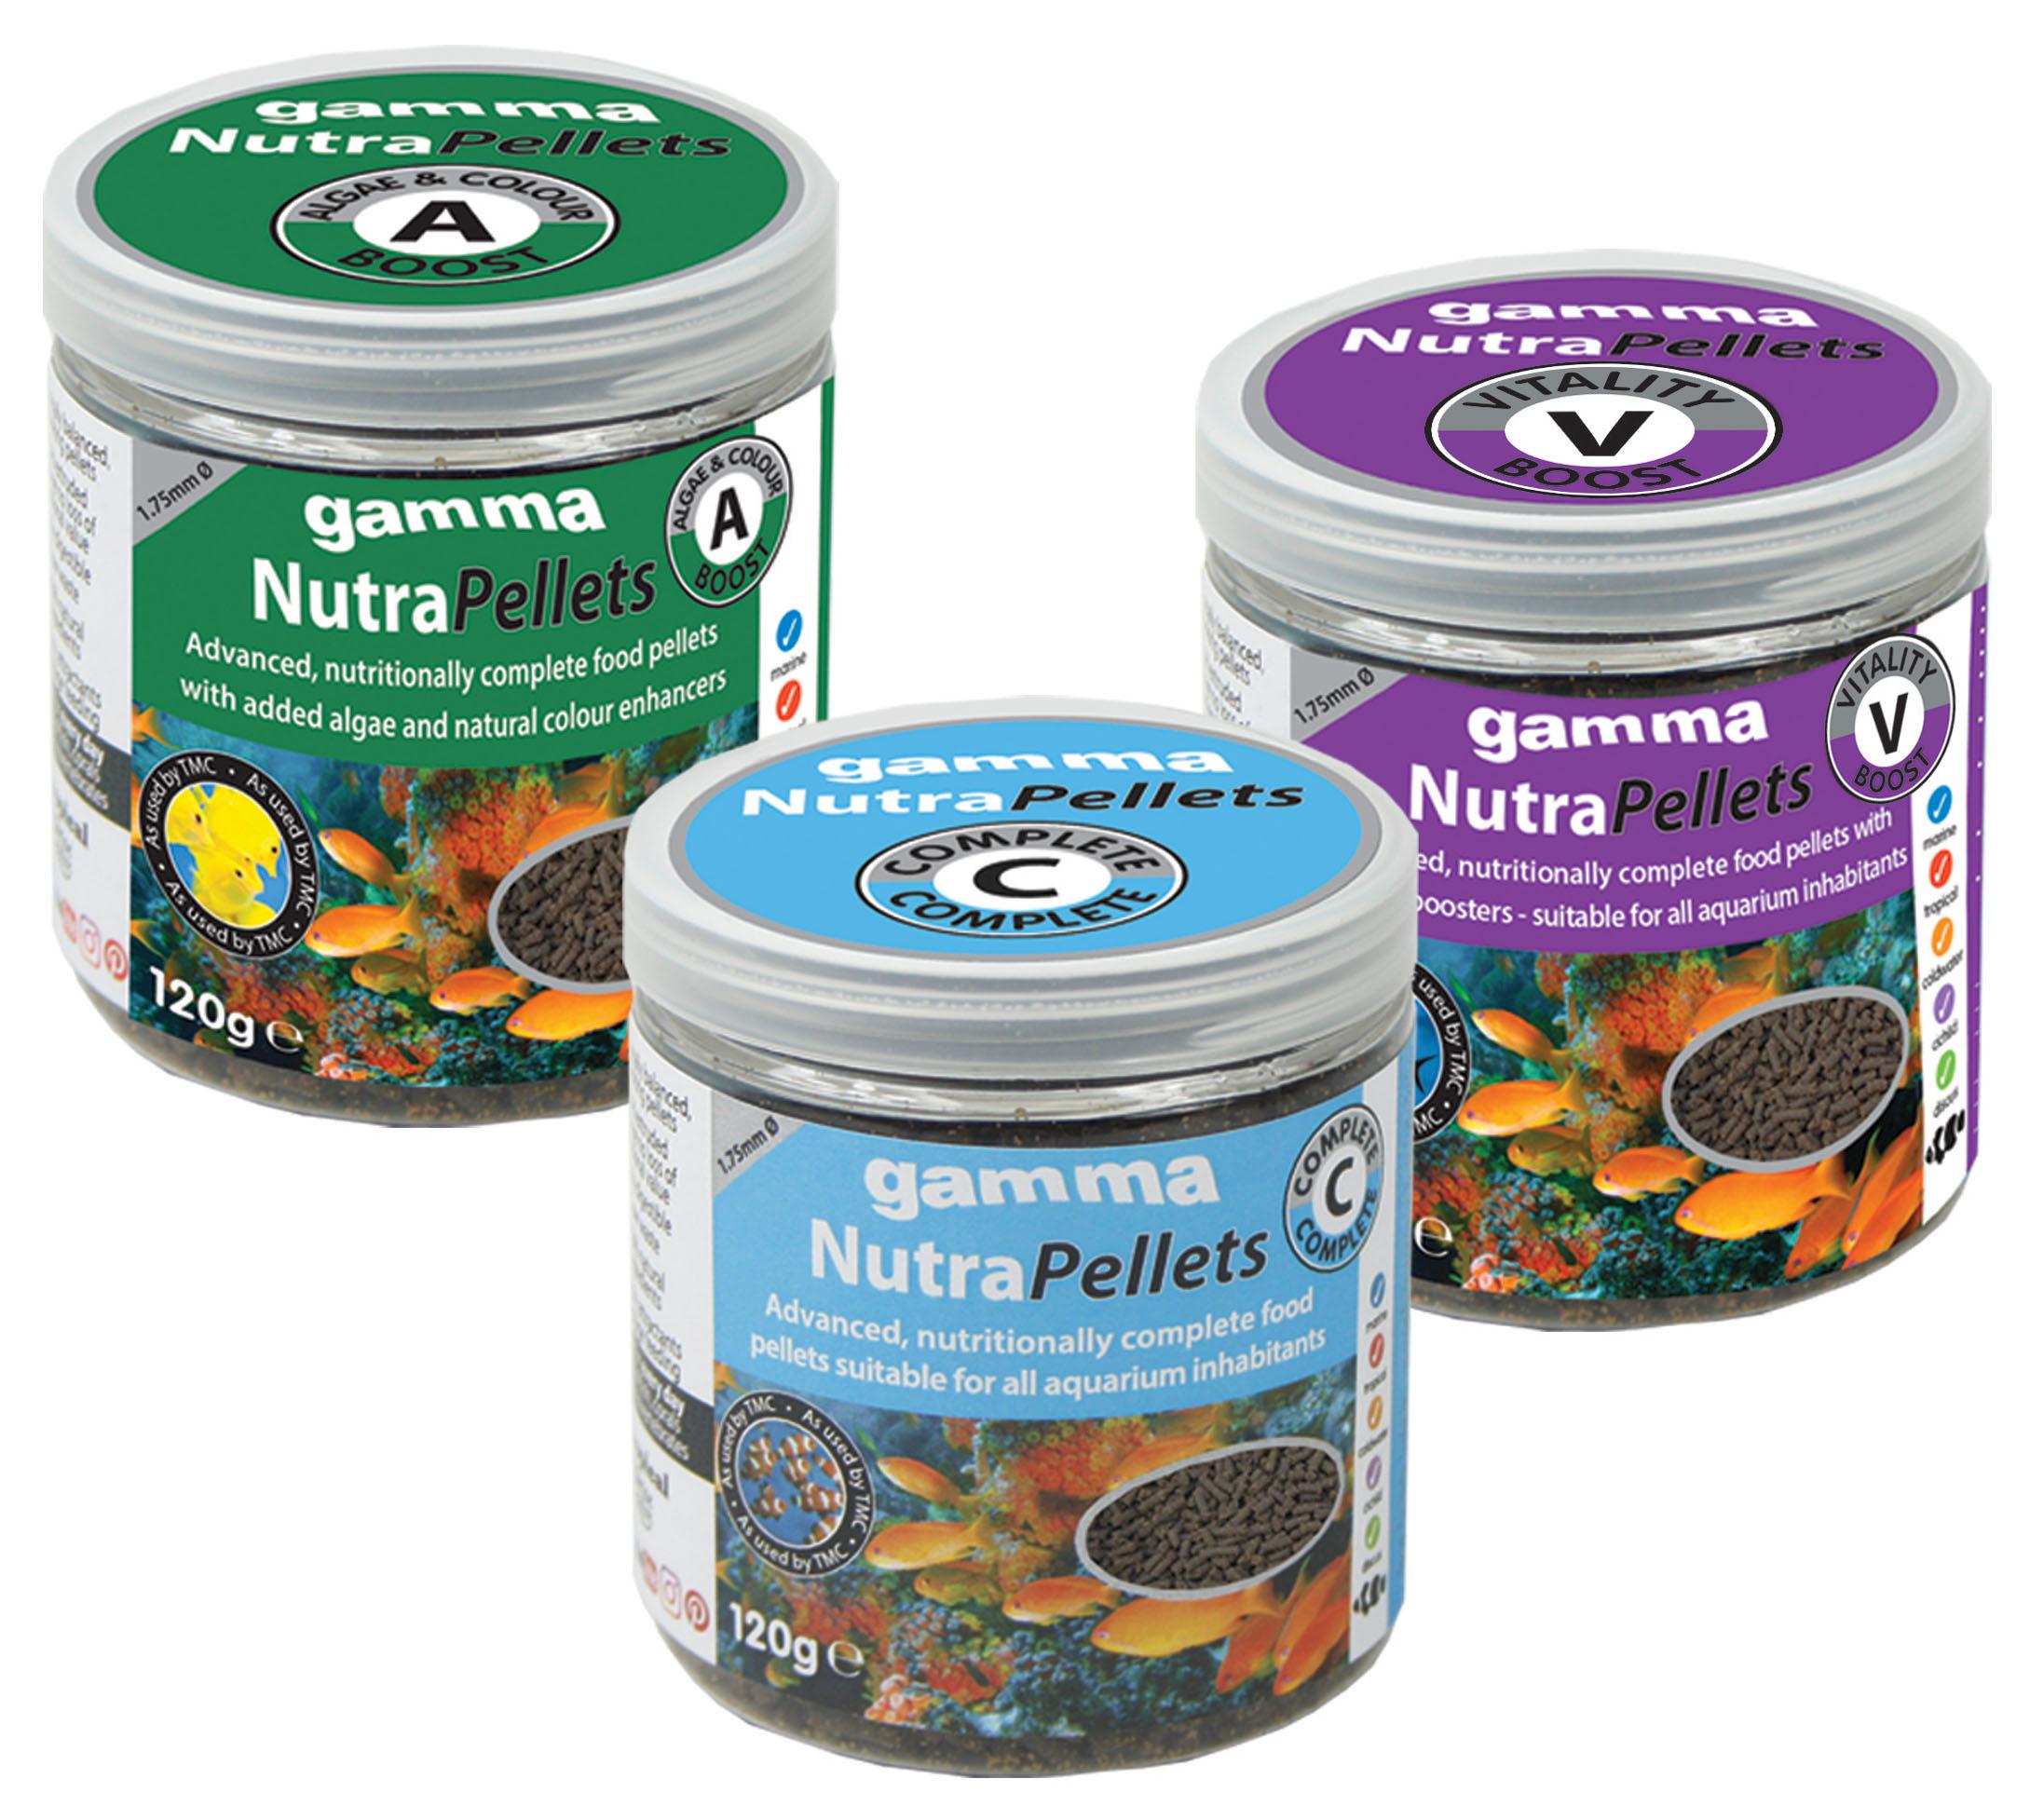 Gamma Foods pot design